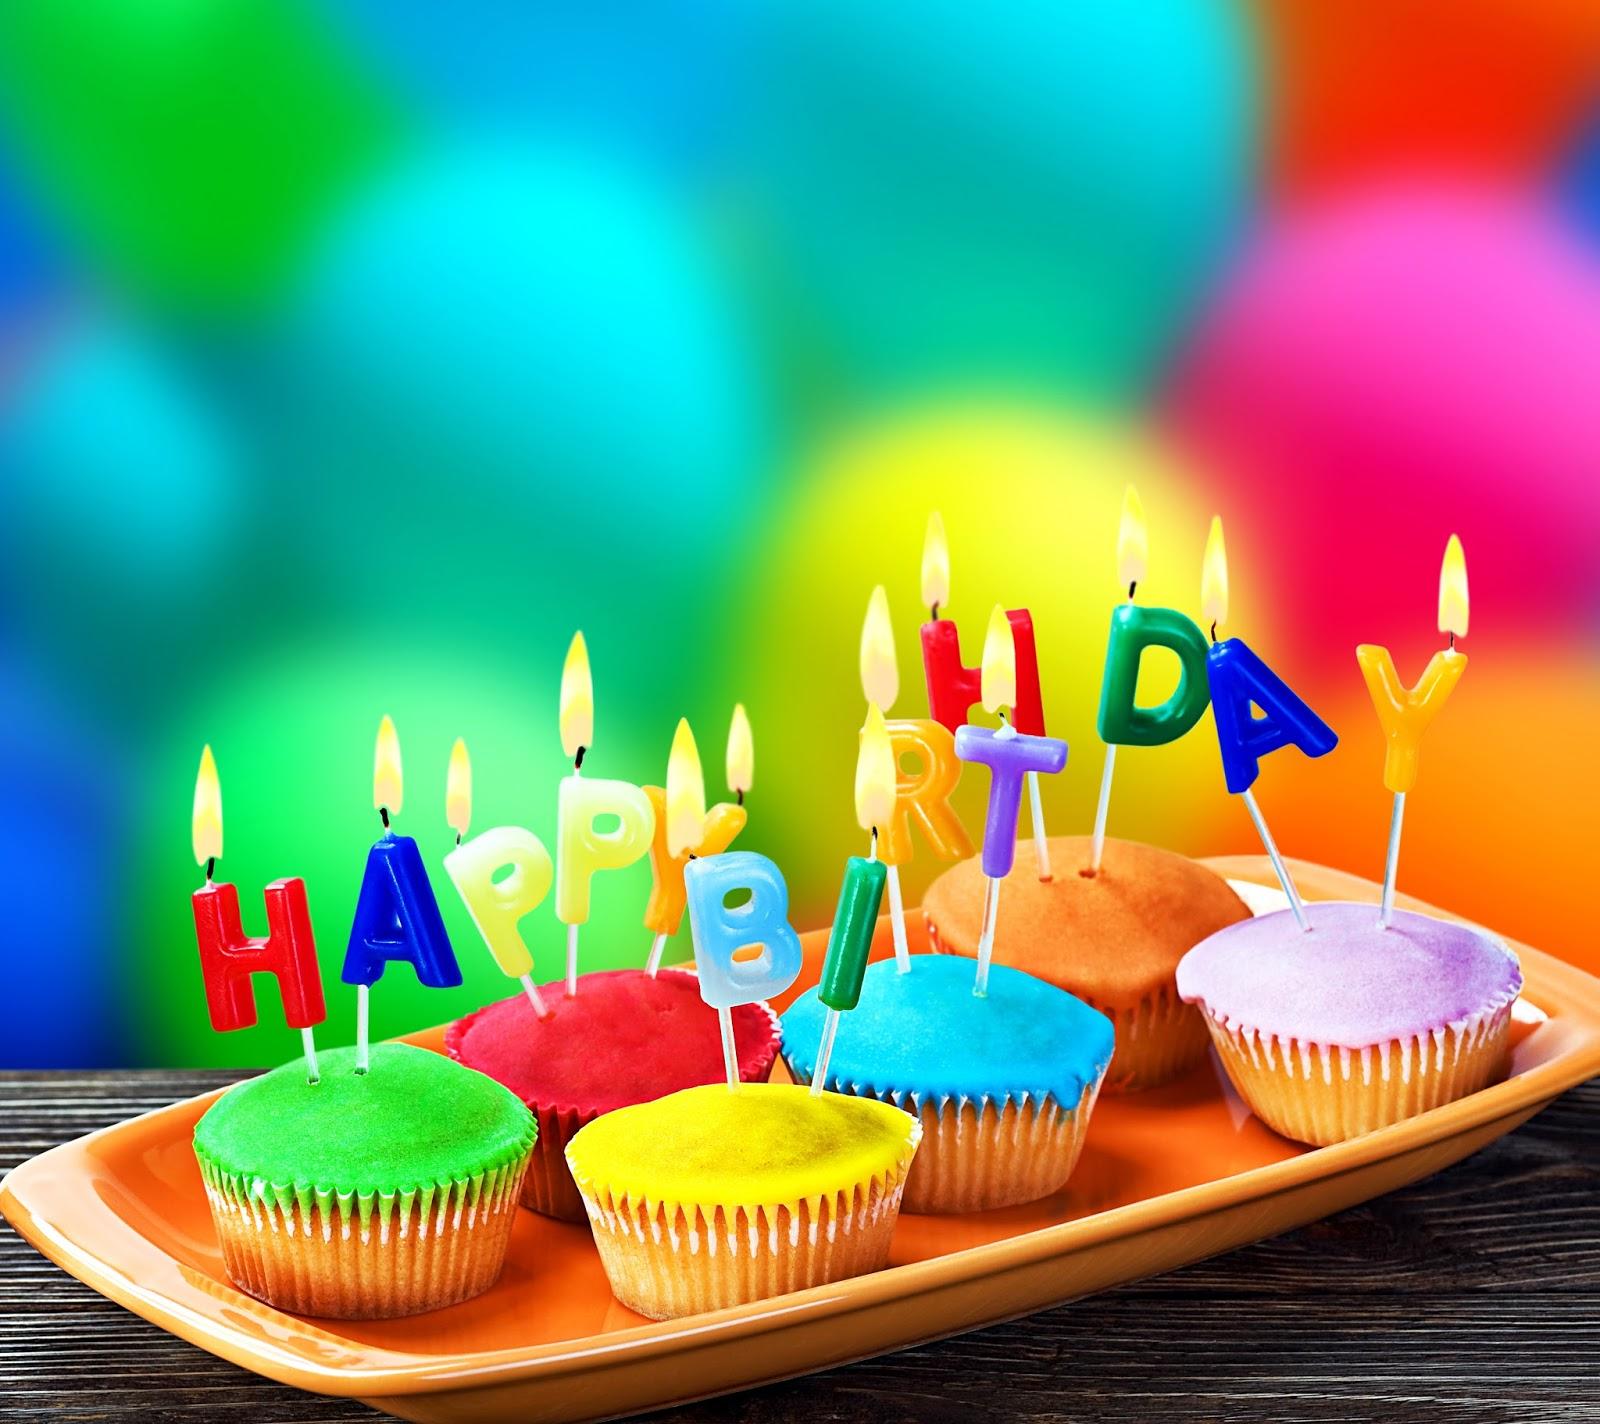 Best happy birthday wishes sai kiran shakewar happy birthday wishes kristyandbryce Images